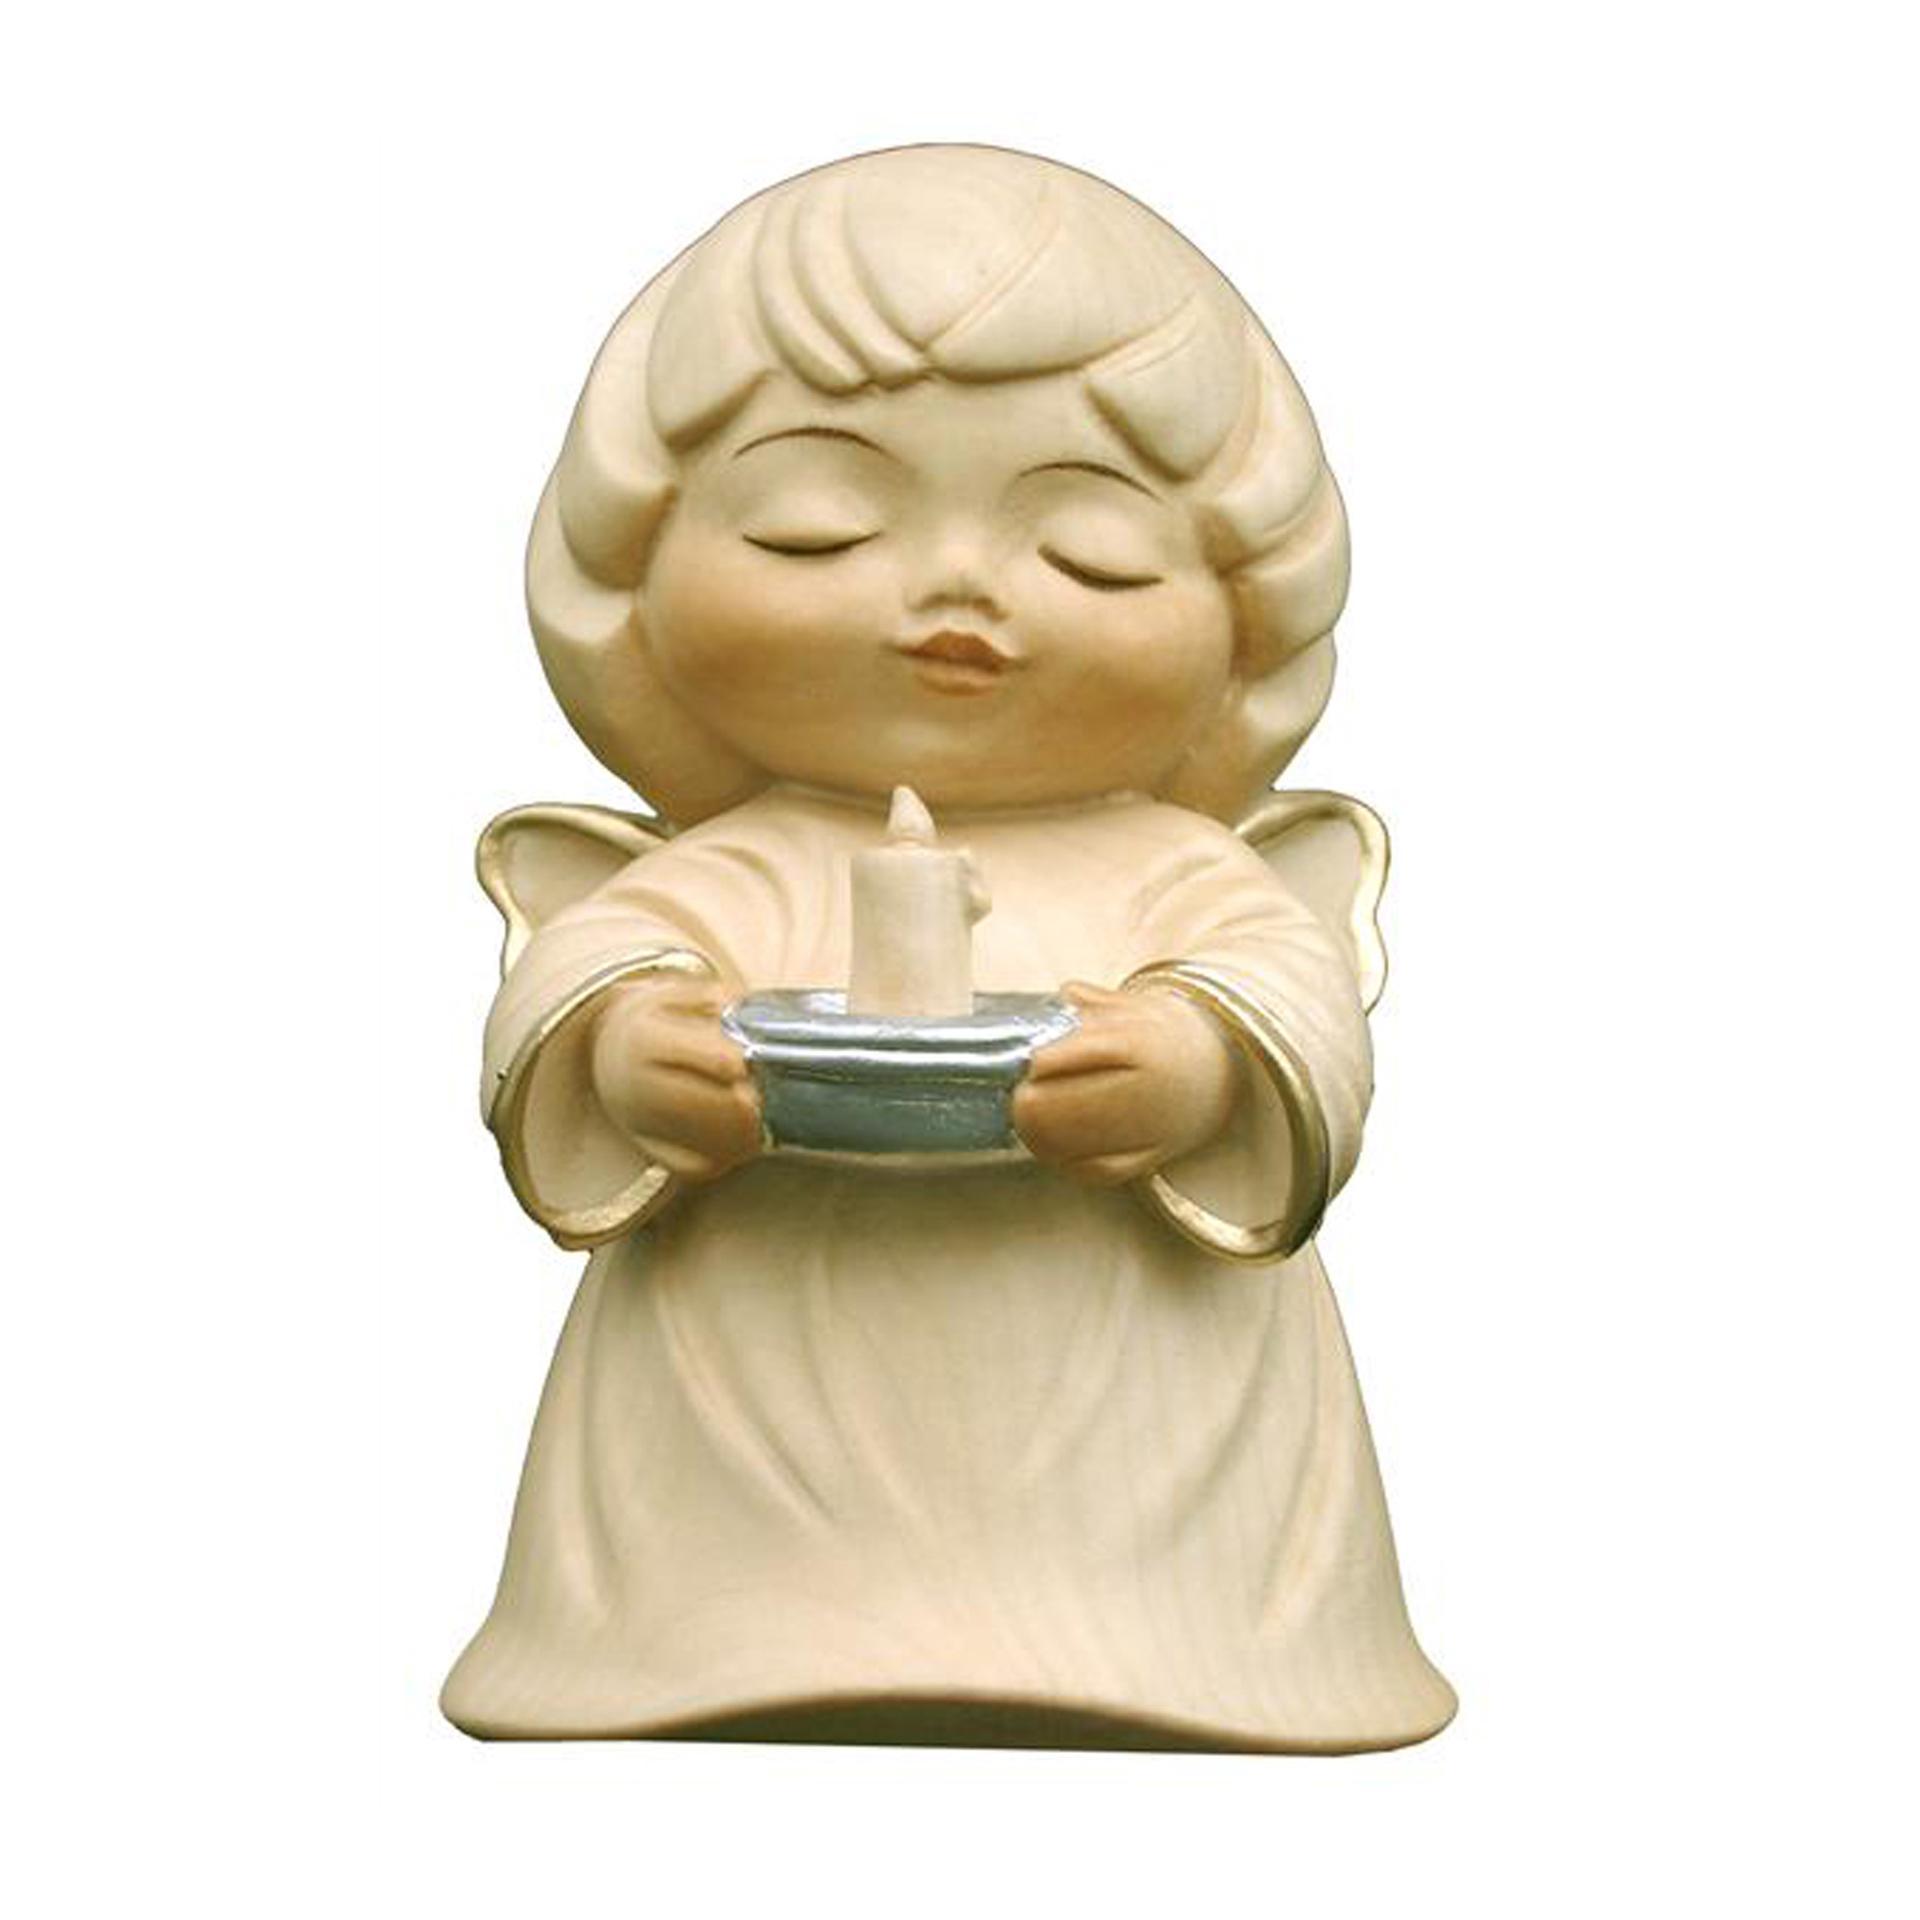 Engel mit Kerze, alabaster